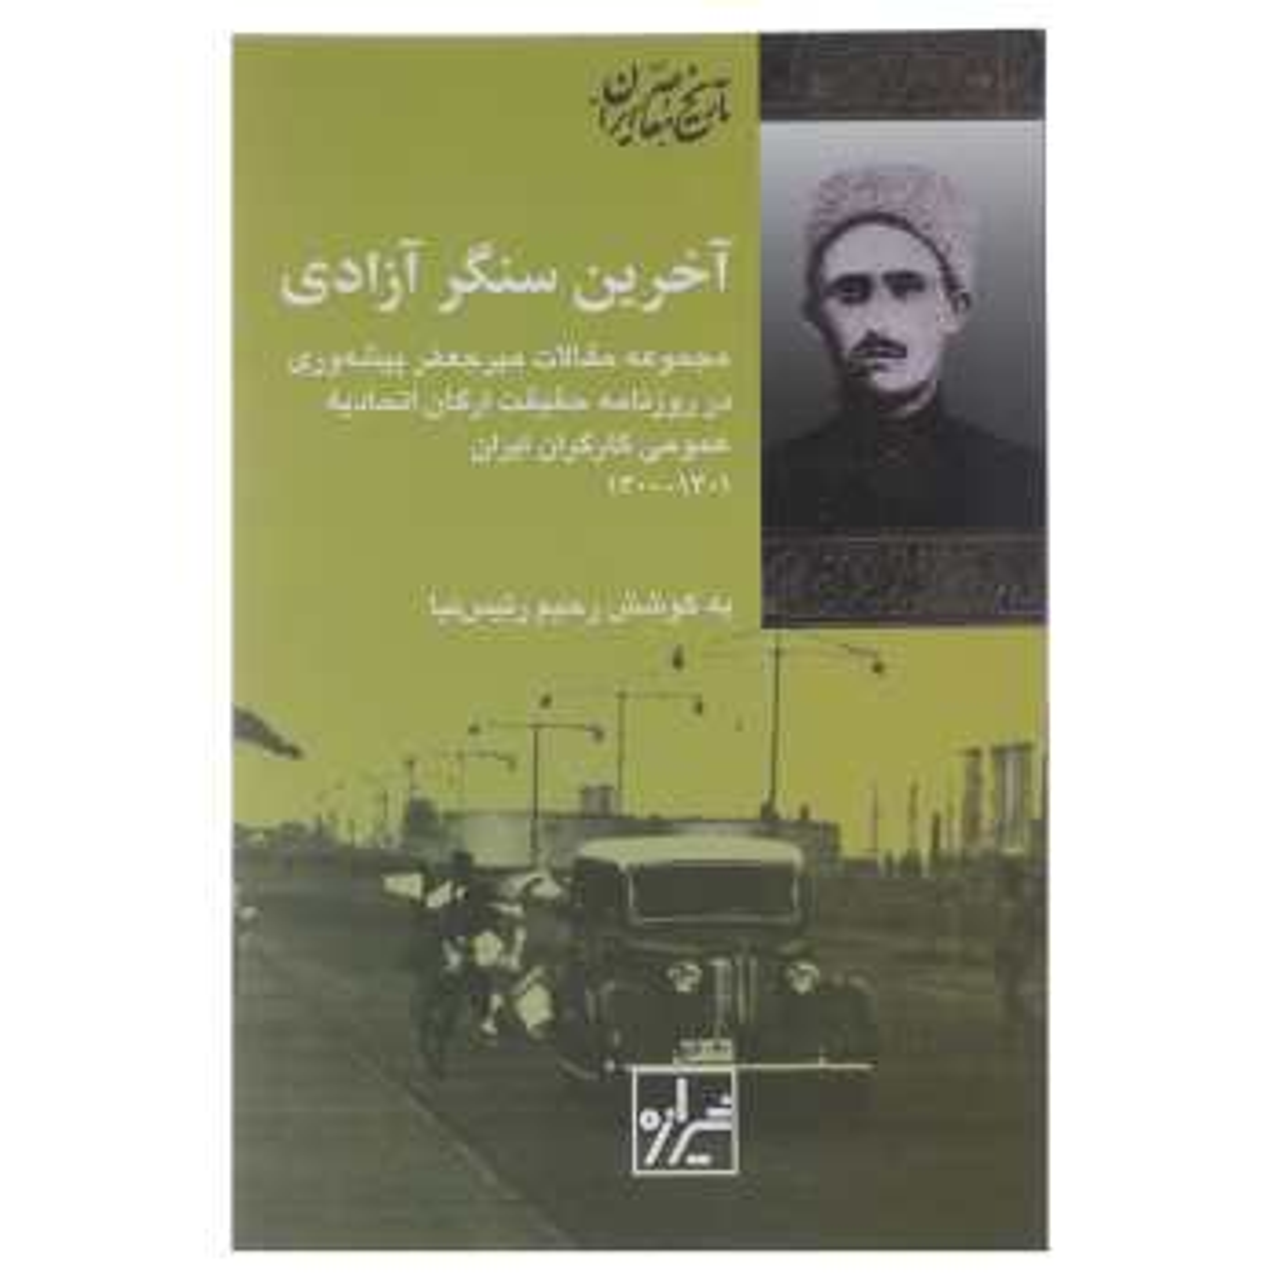 کتاب آخرین سنگر آزادی اثر رحیم رئیس نیا